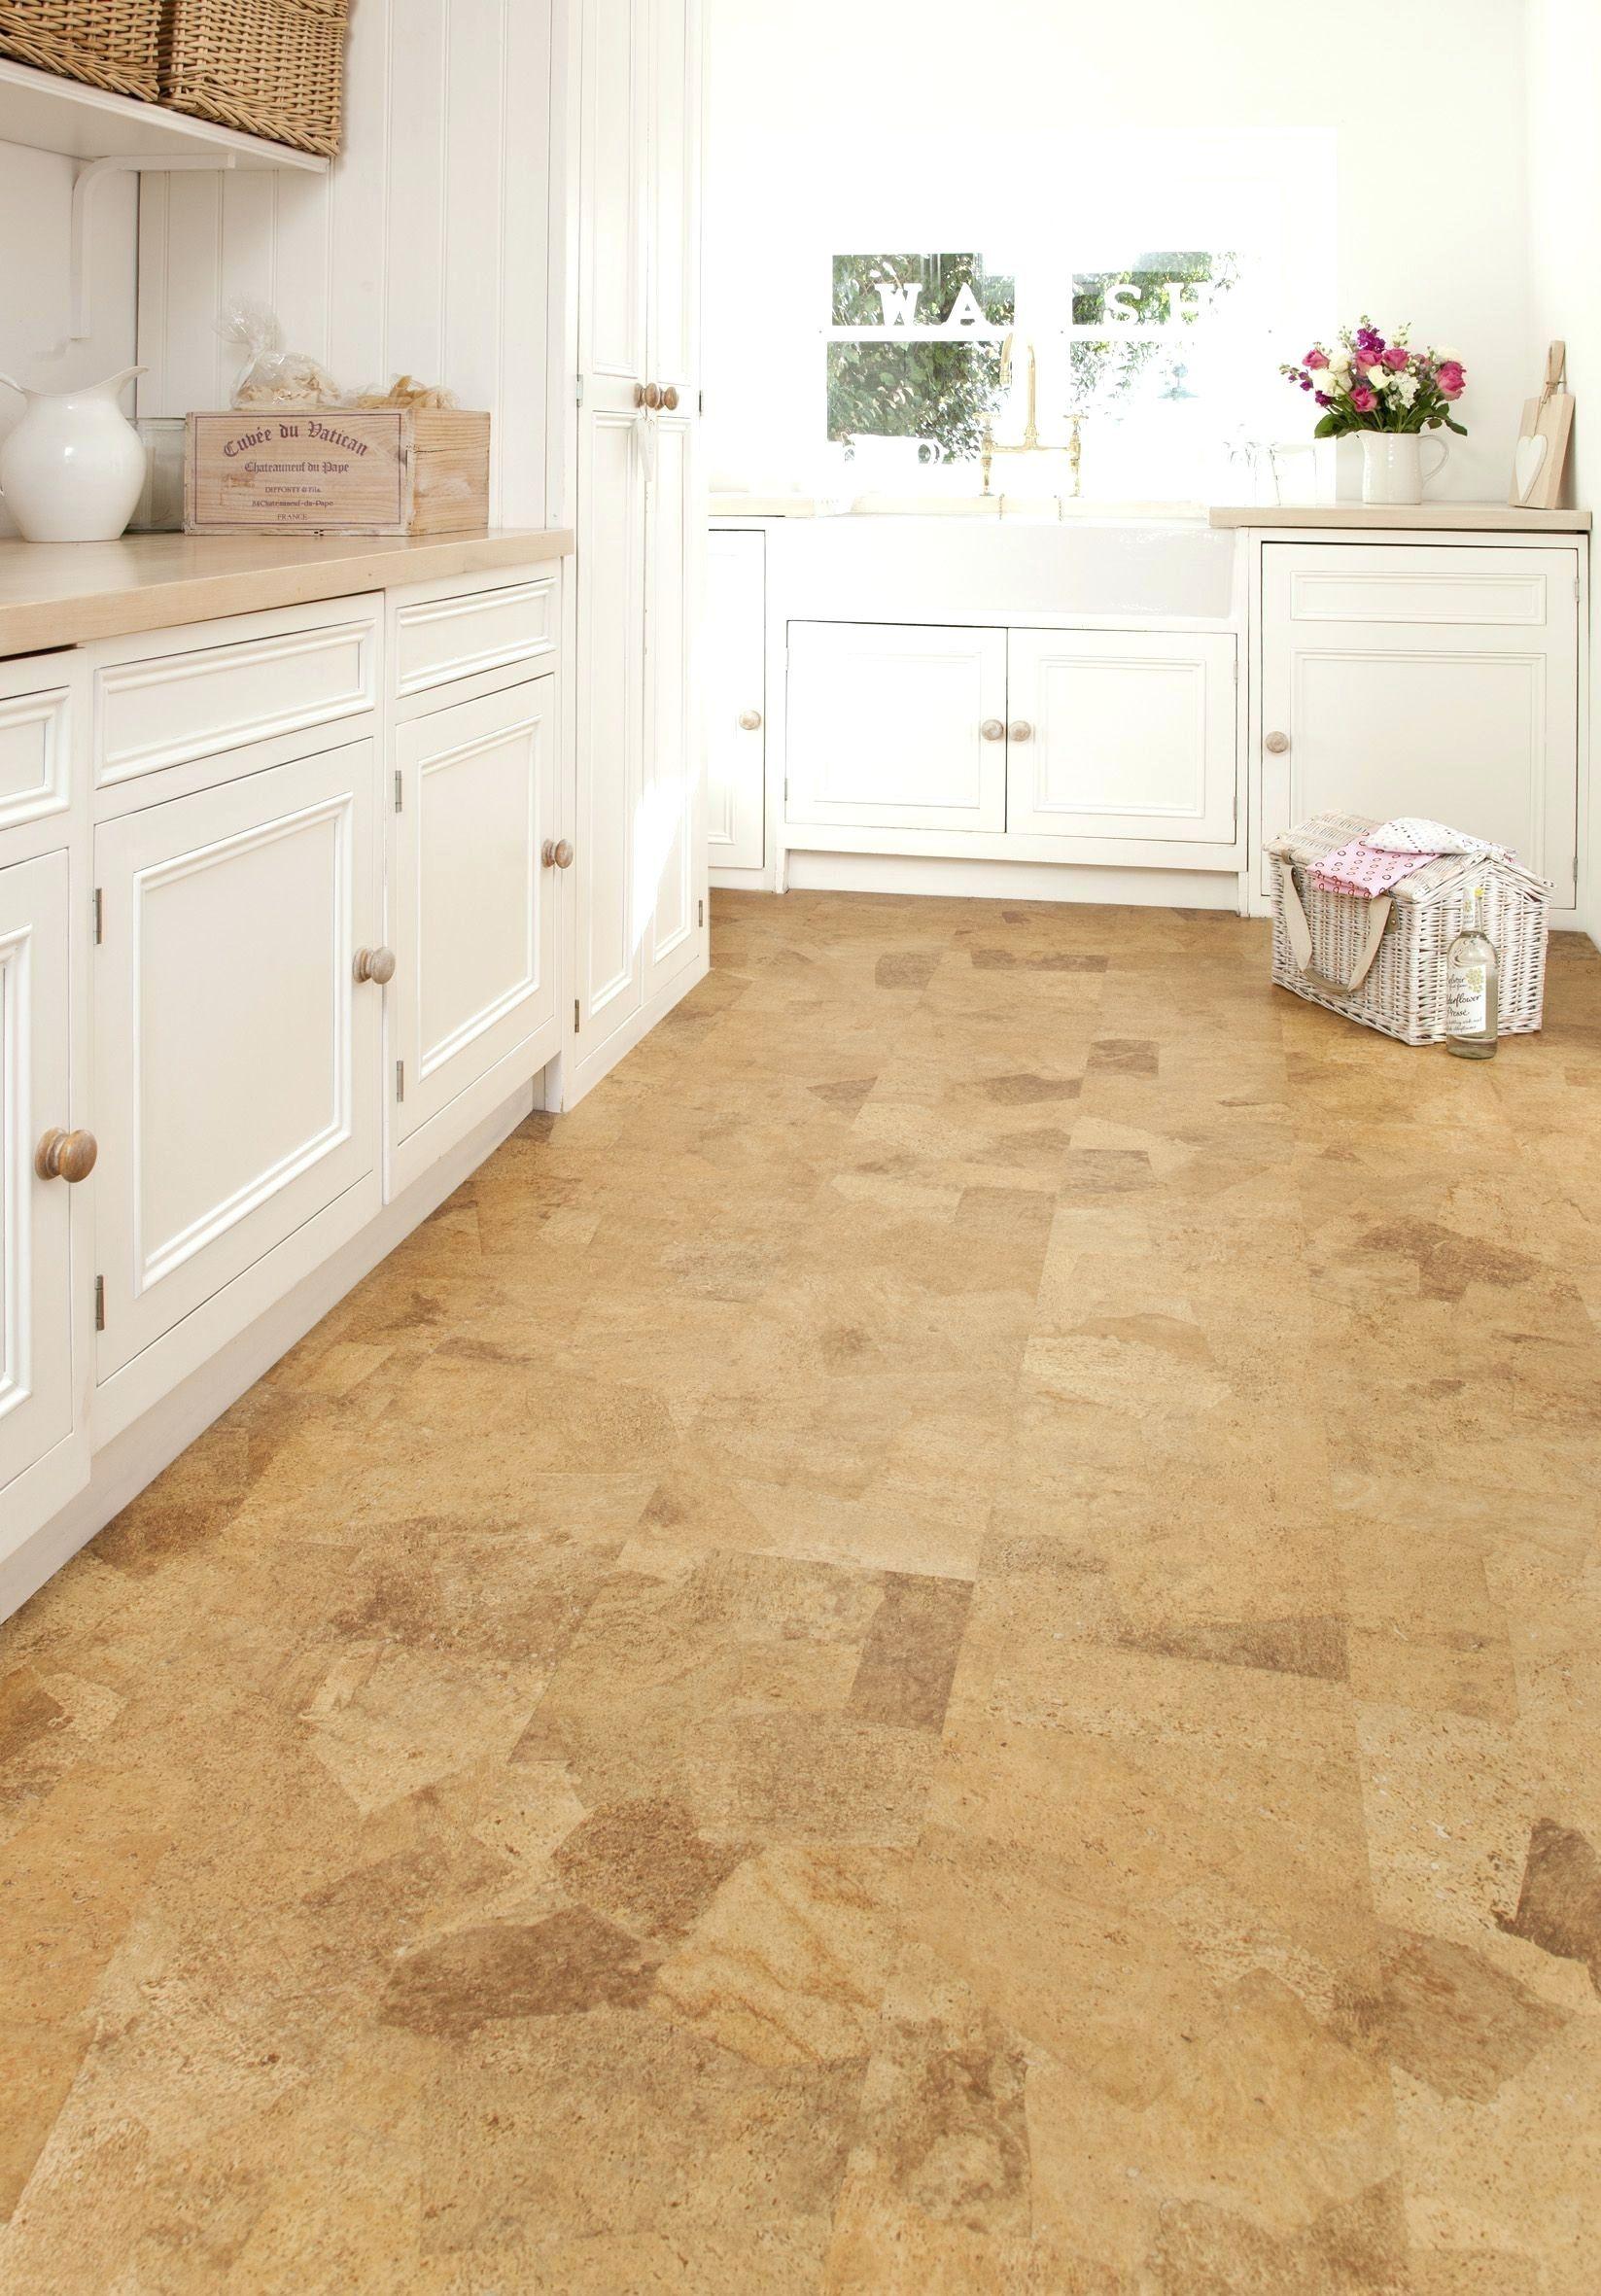 Cork Floor Tiles Homebase   Cork flooring kitchen, Modern kitchen ...